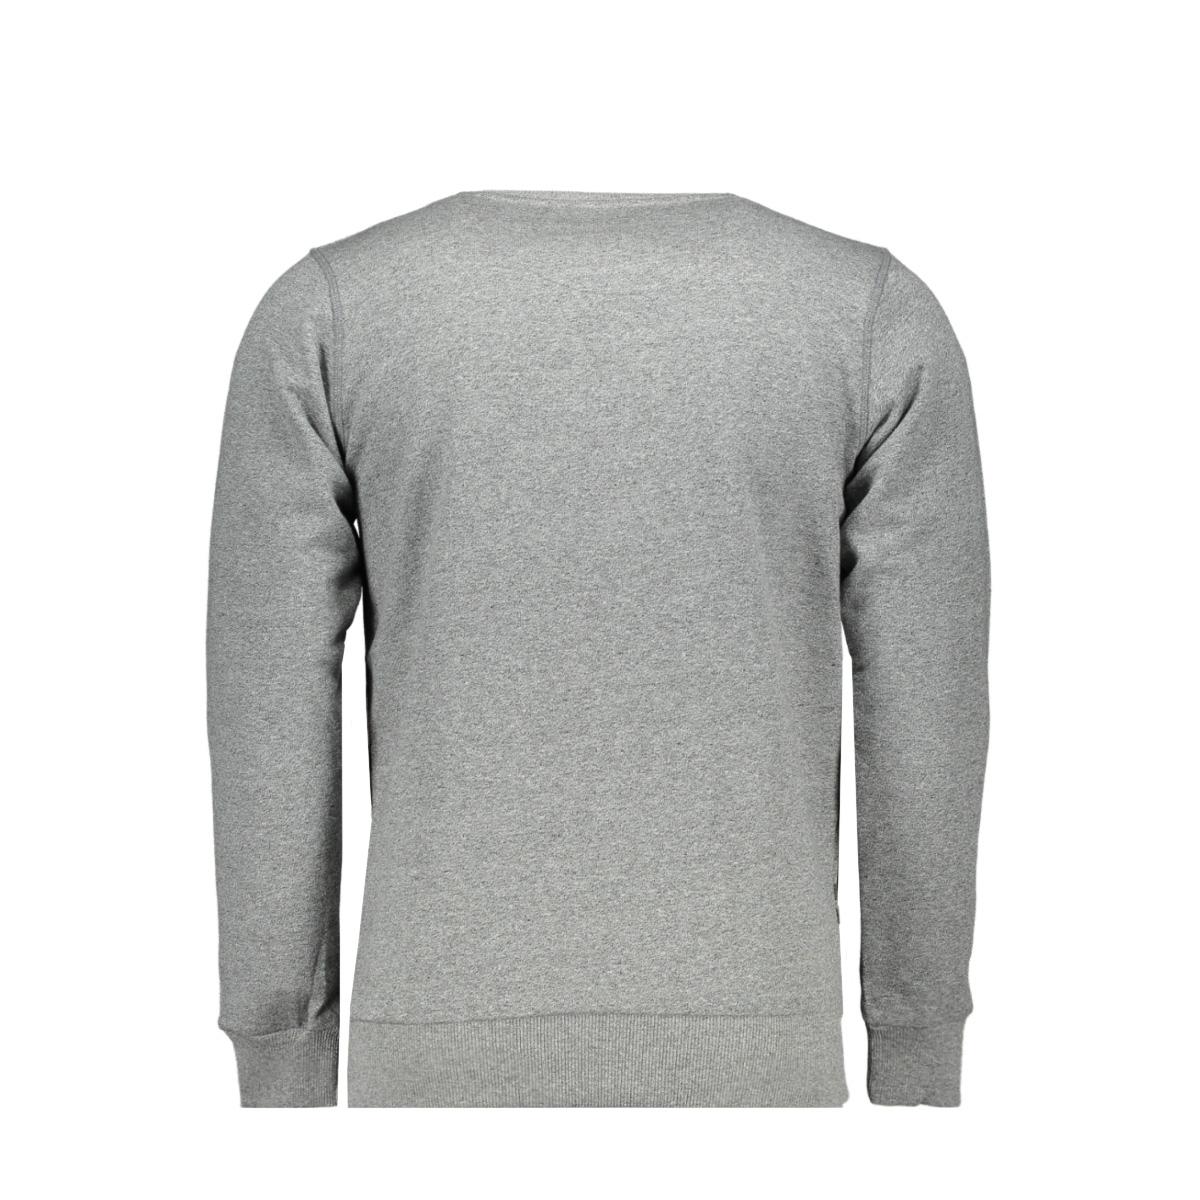 76134 gabbiano sweater grey